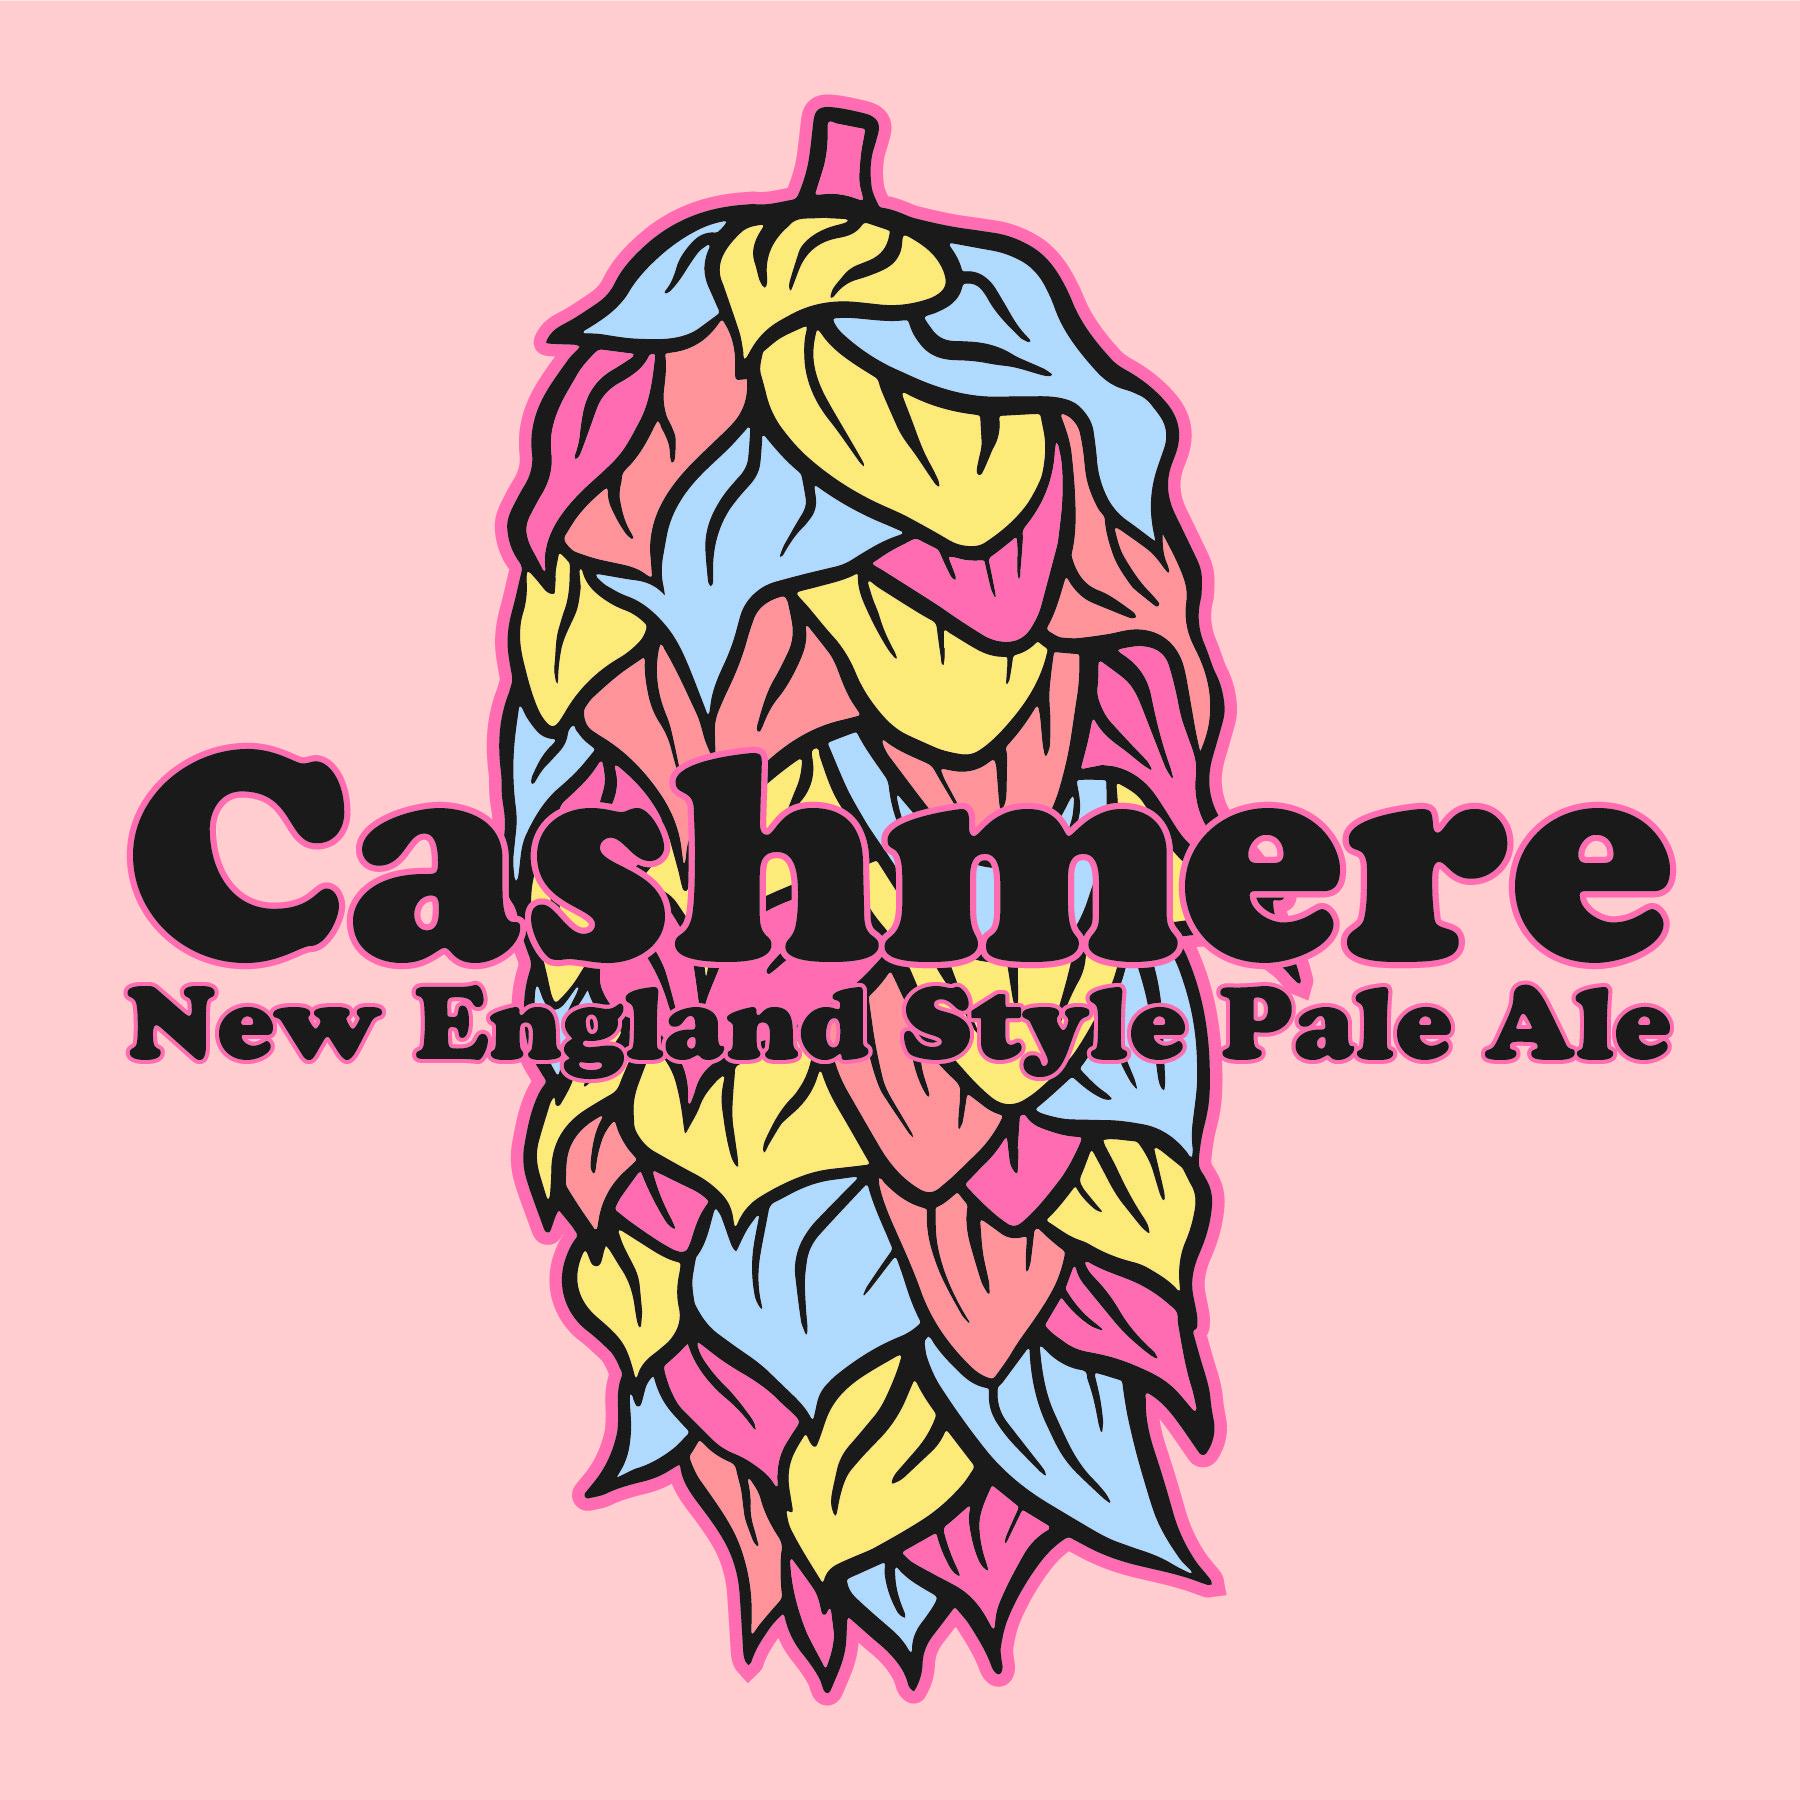 Cashmere NE Style IPA.jpg